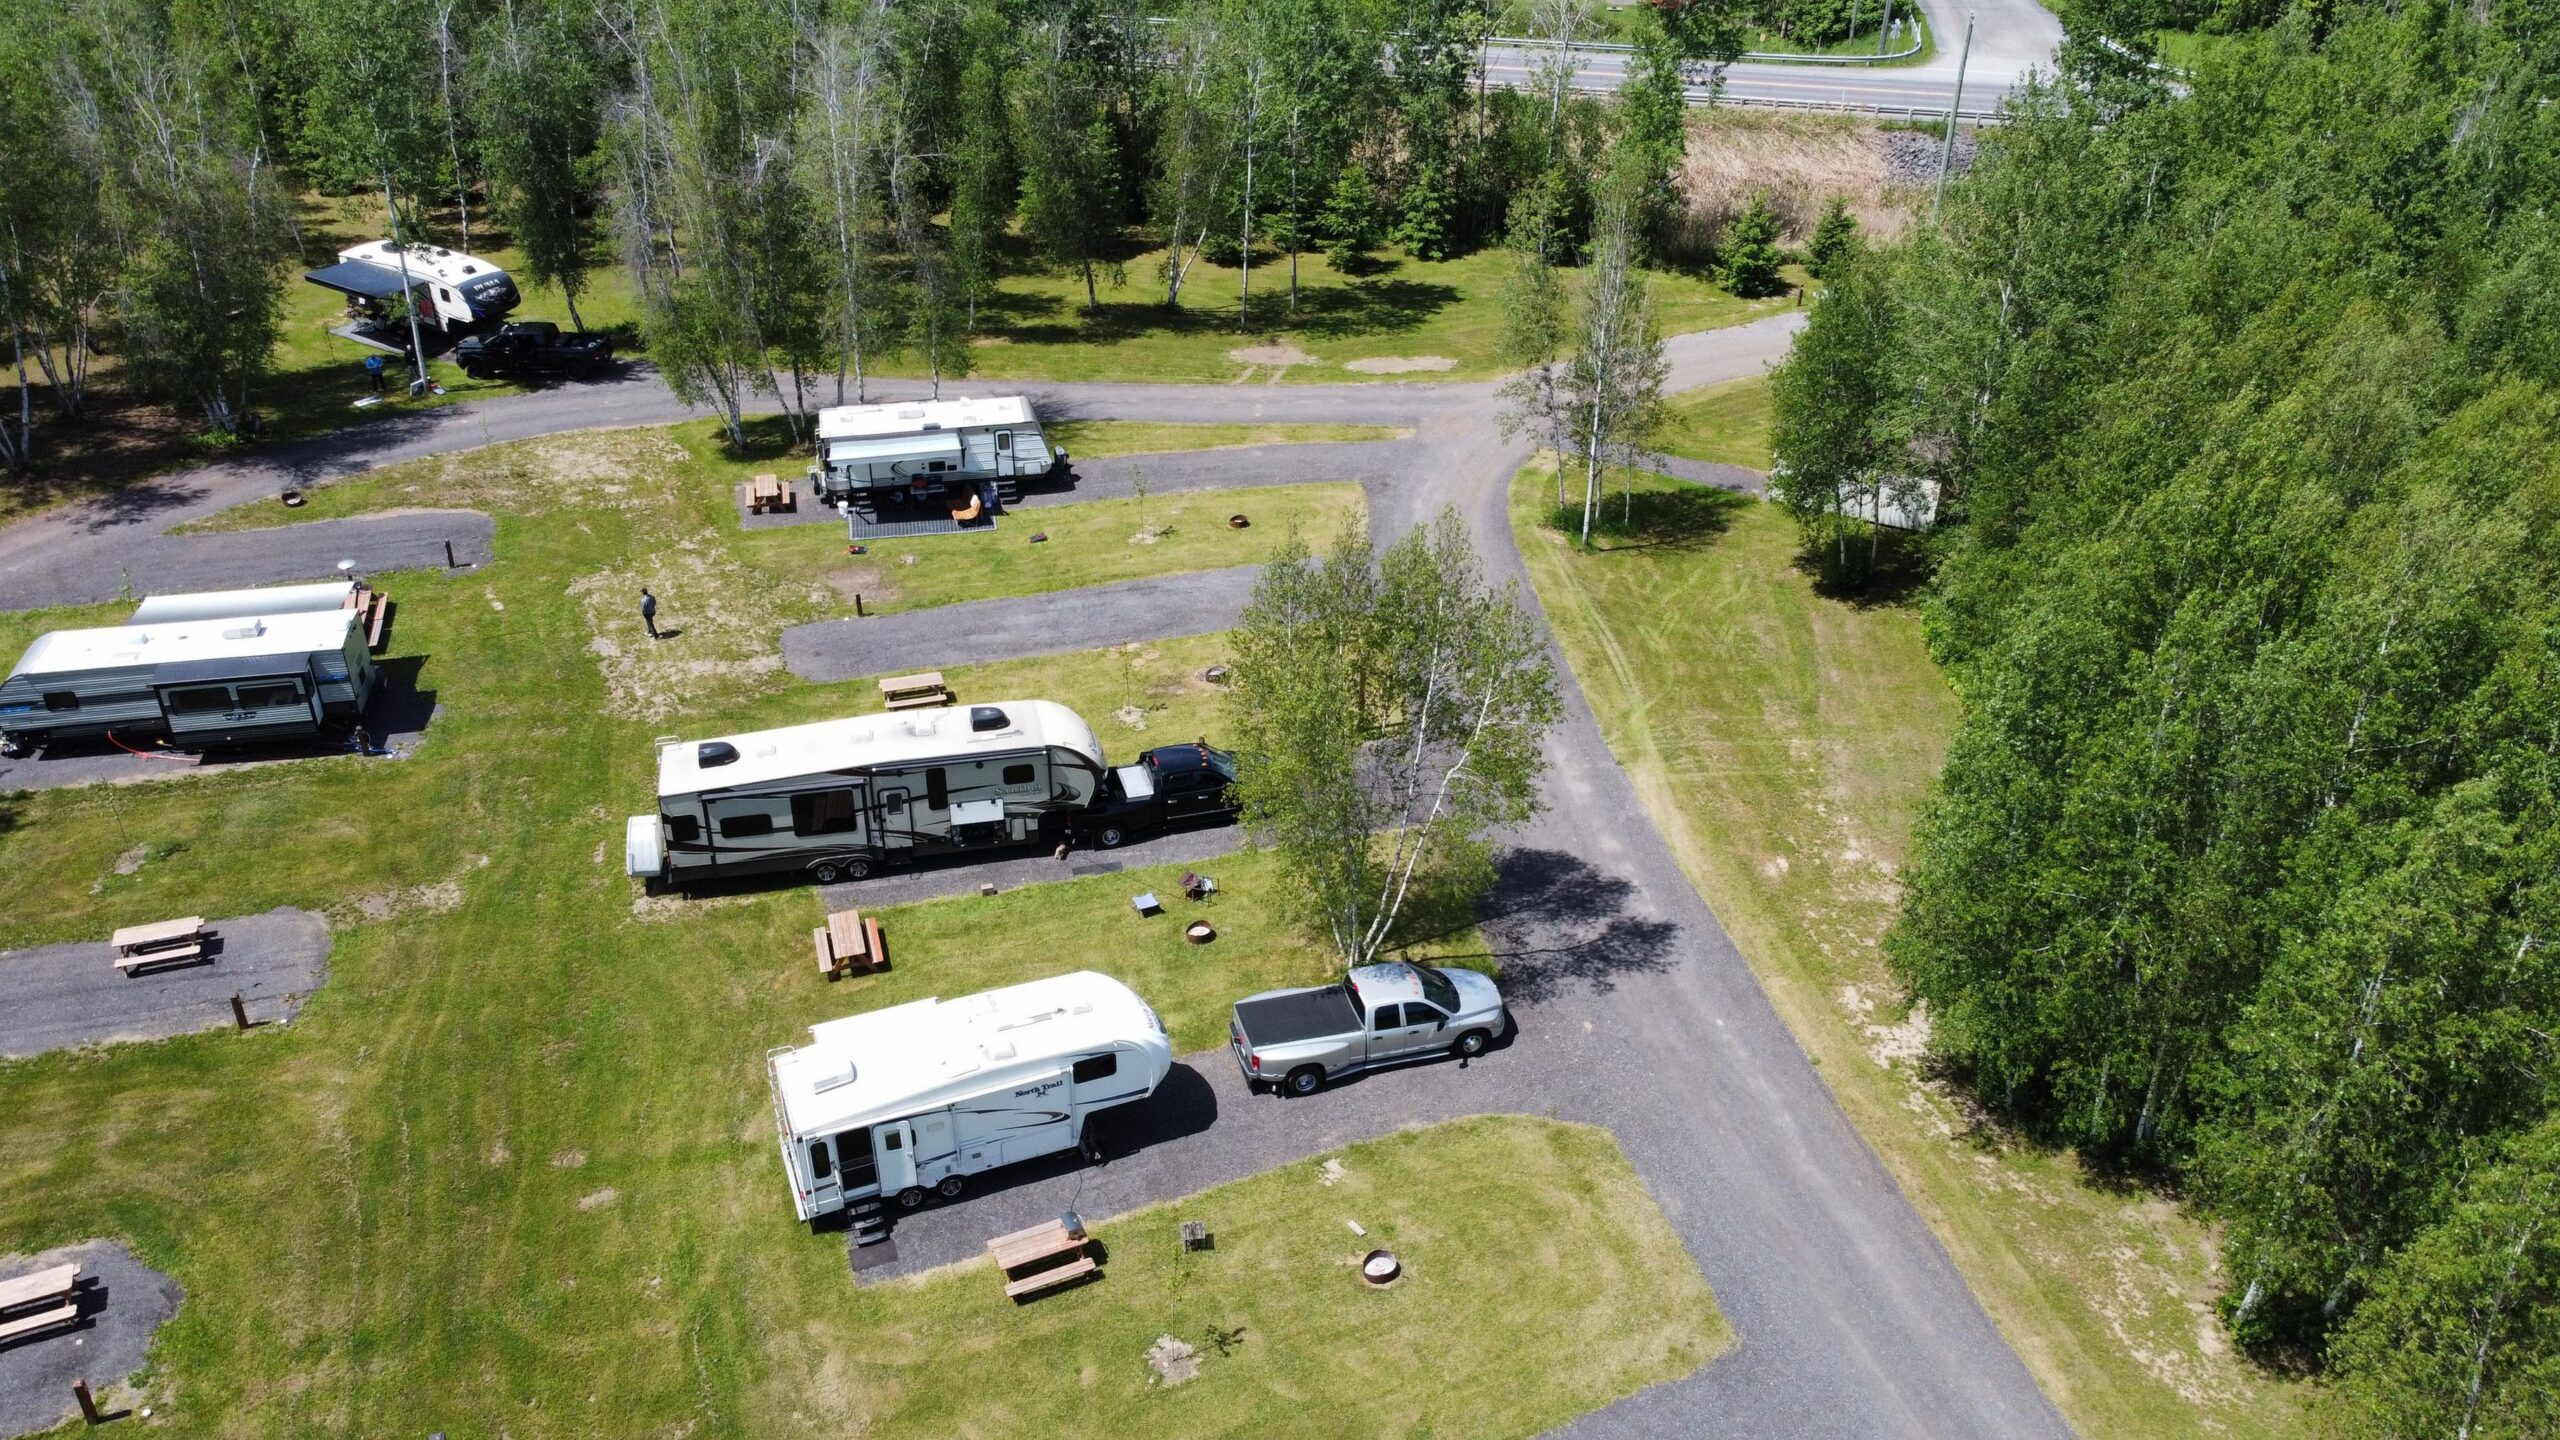 camping_vue aérienne 2